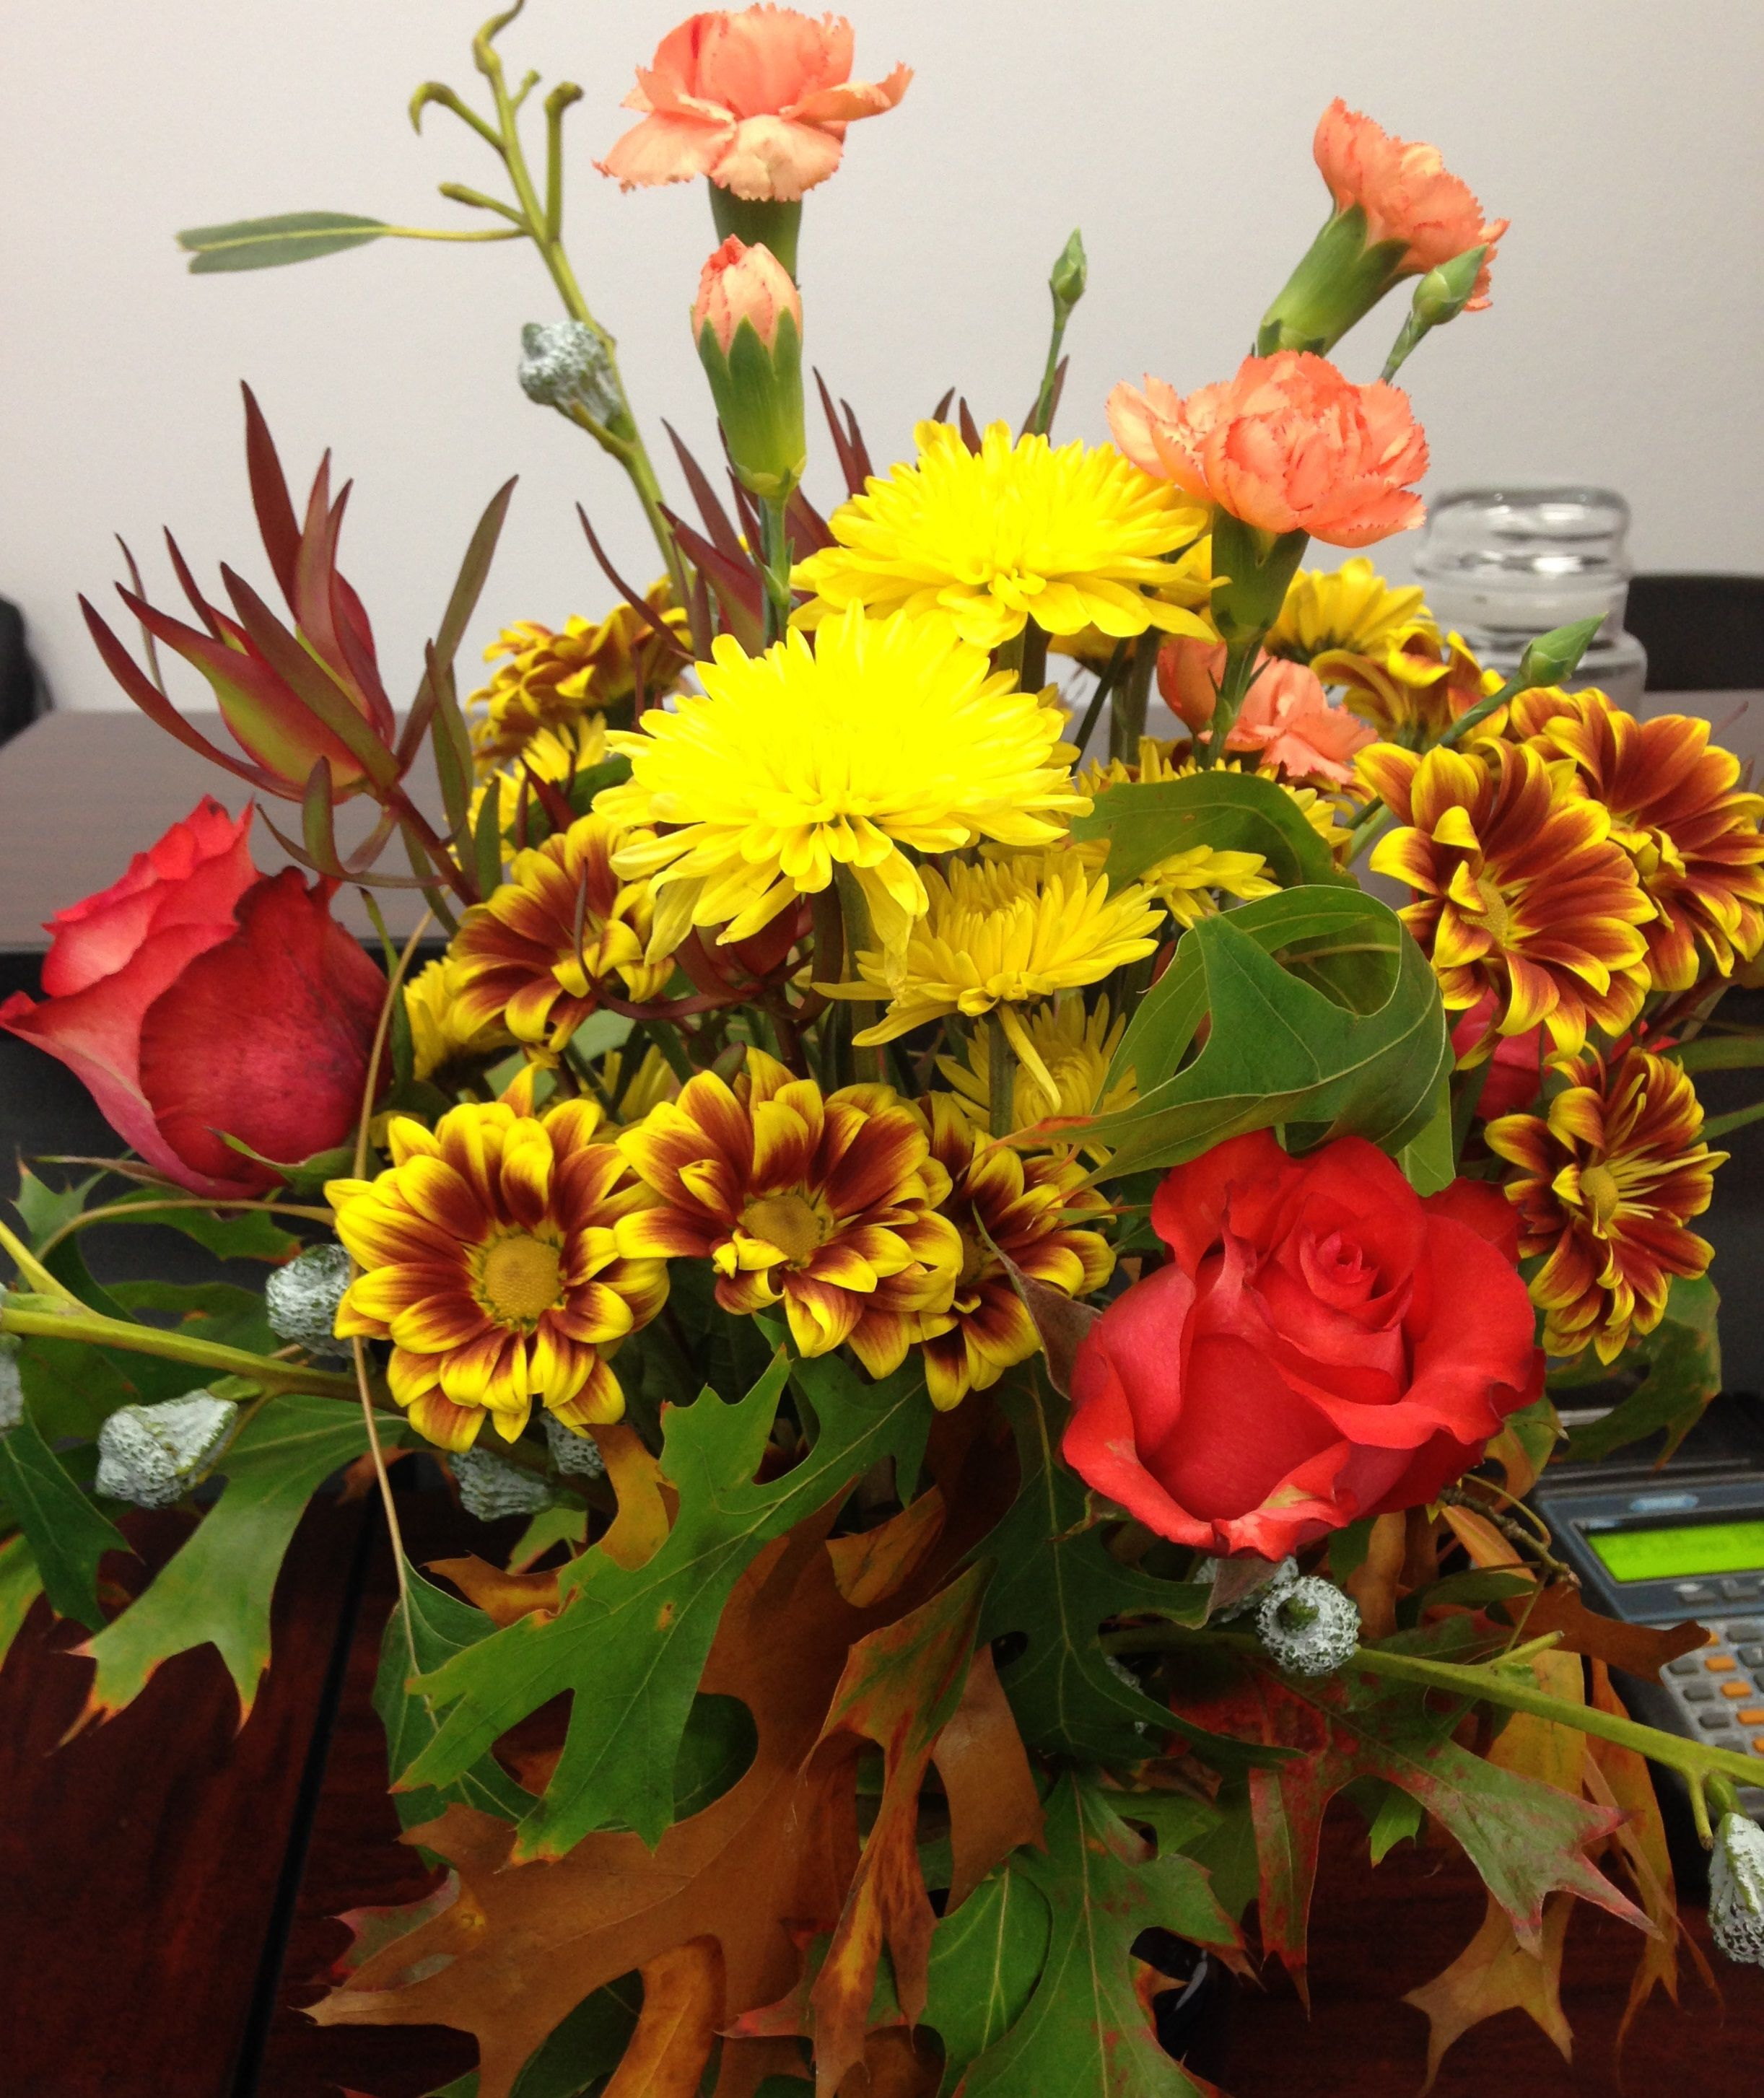 Fall fun from Lee's Florist